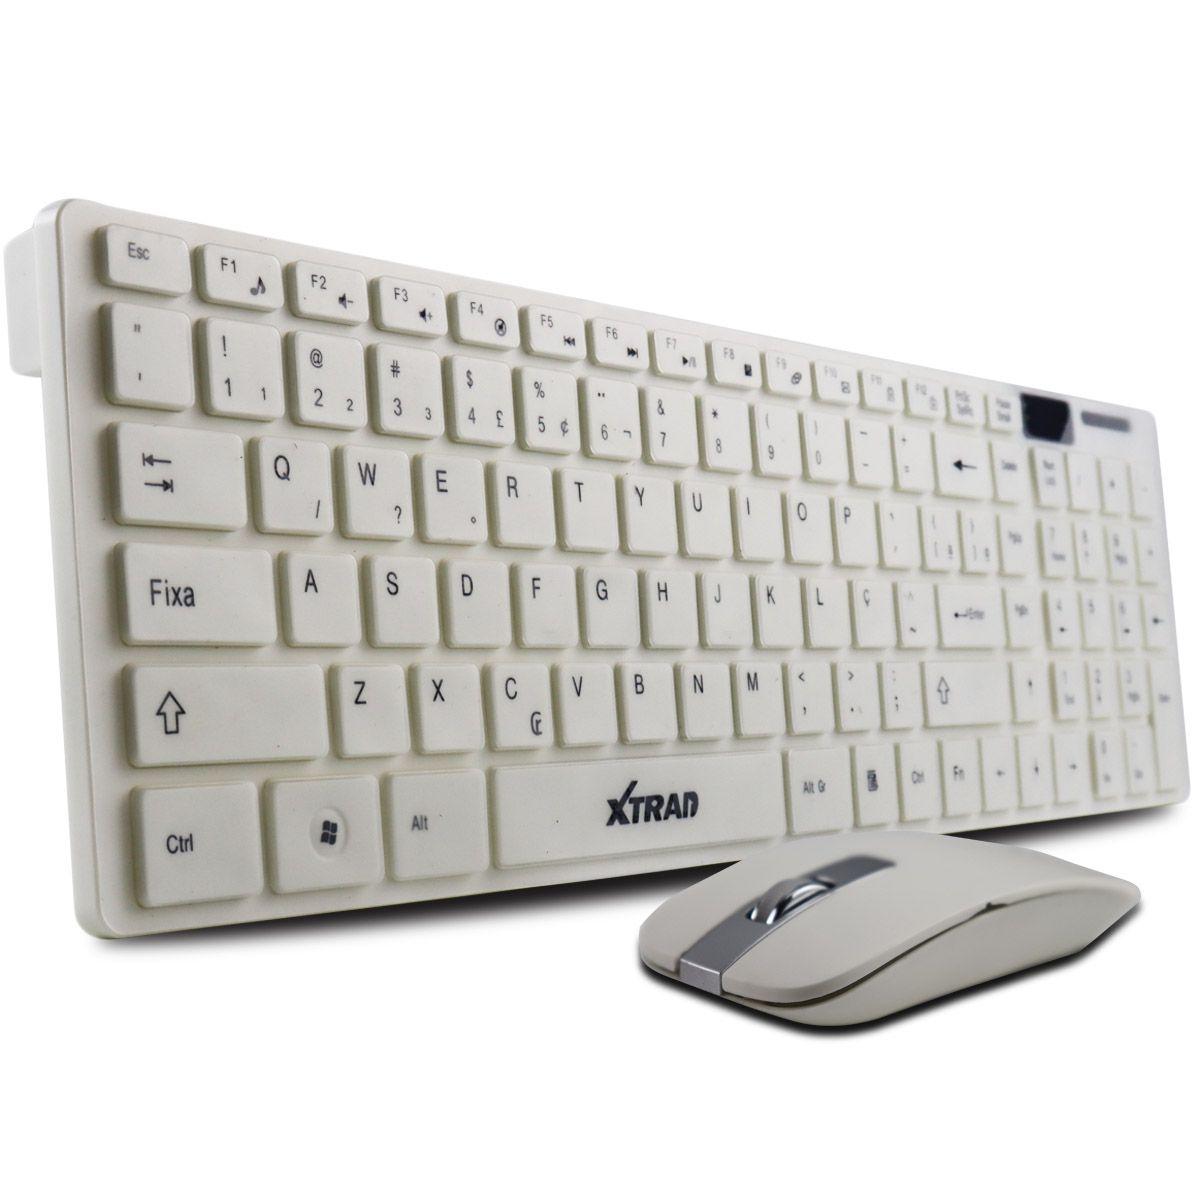 Kit Teclado e Mouse Sem Fio Xtrad HK8200